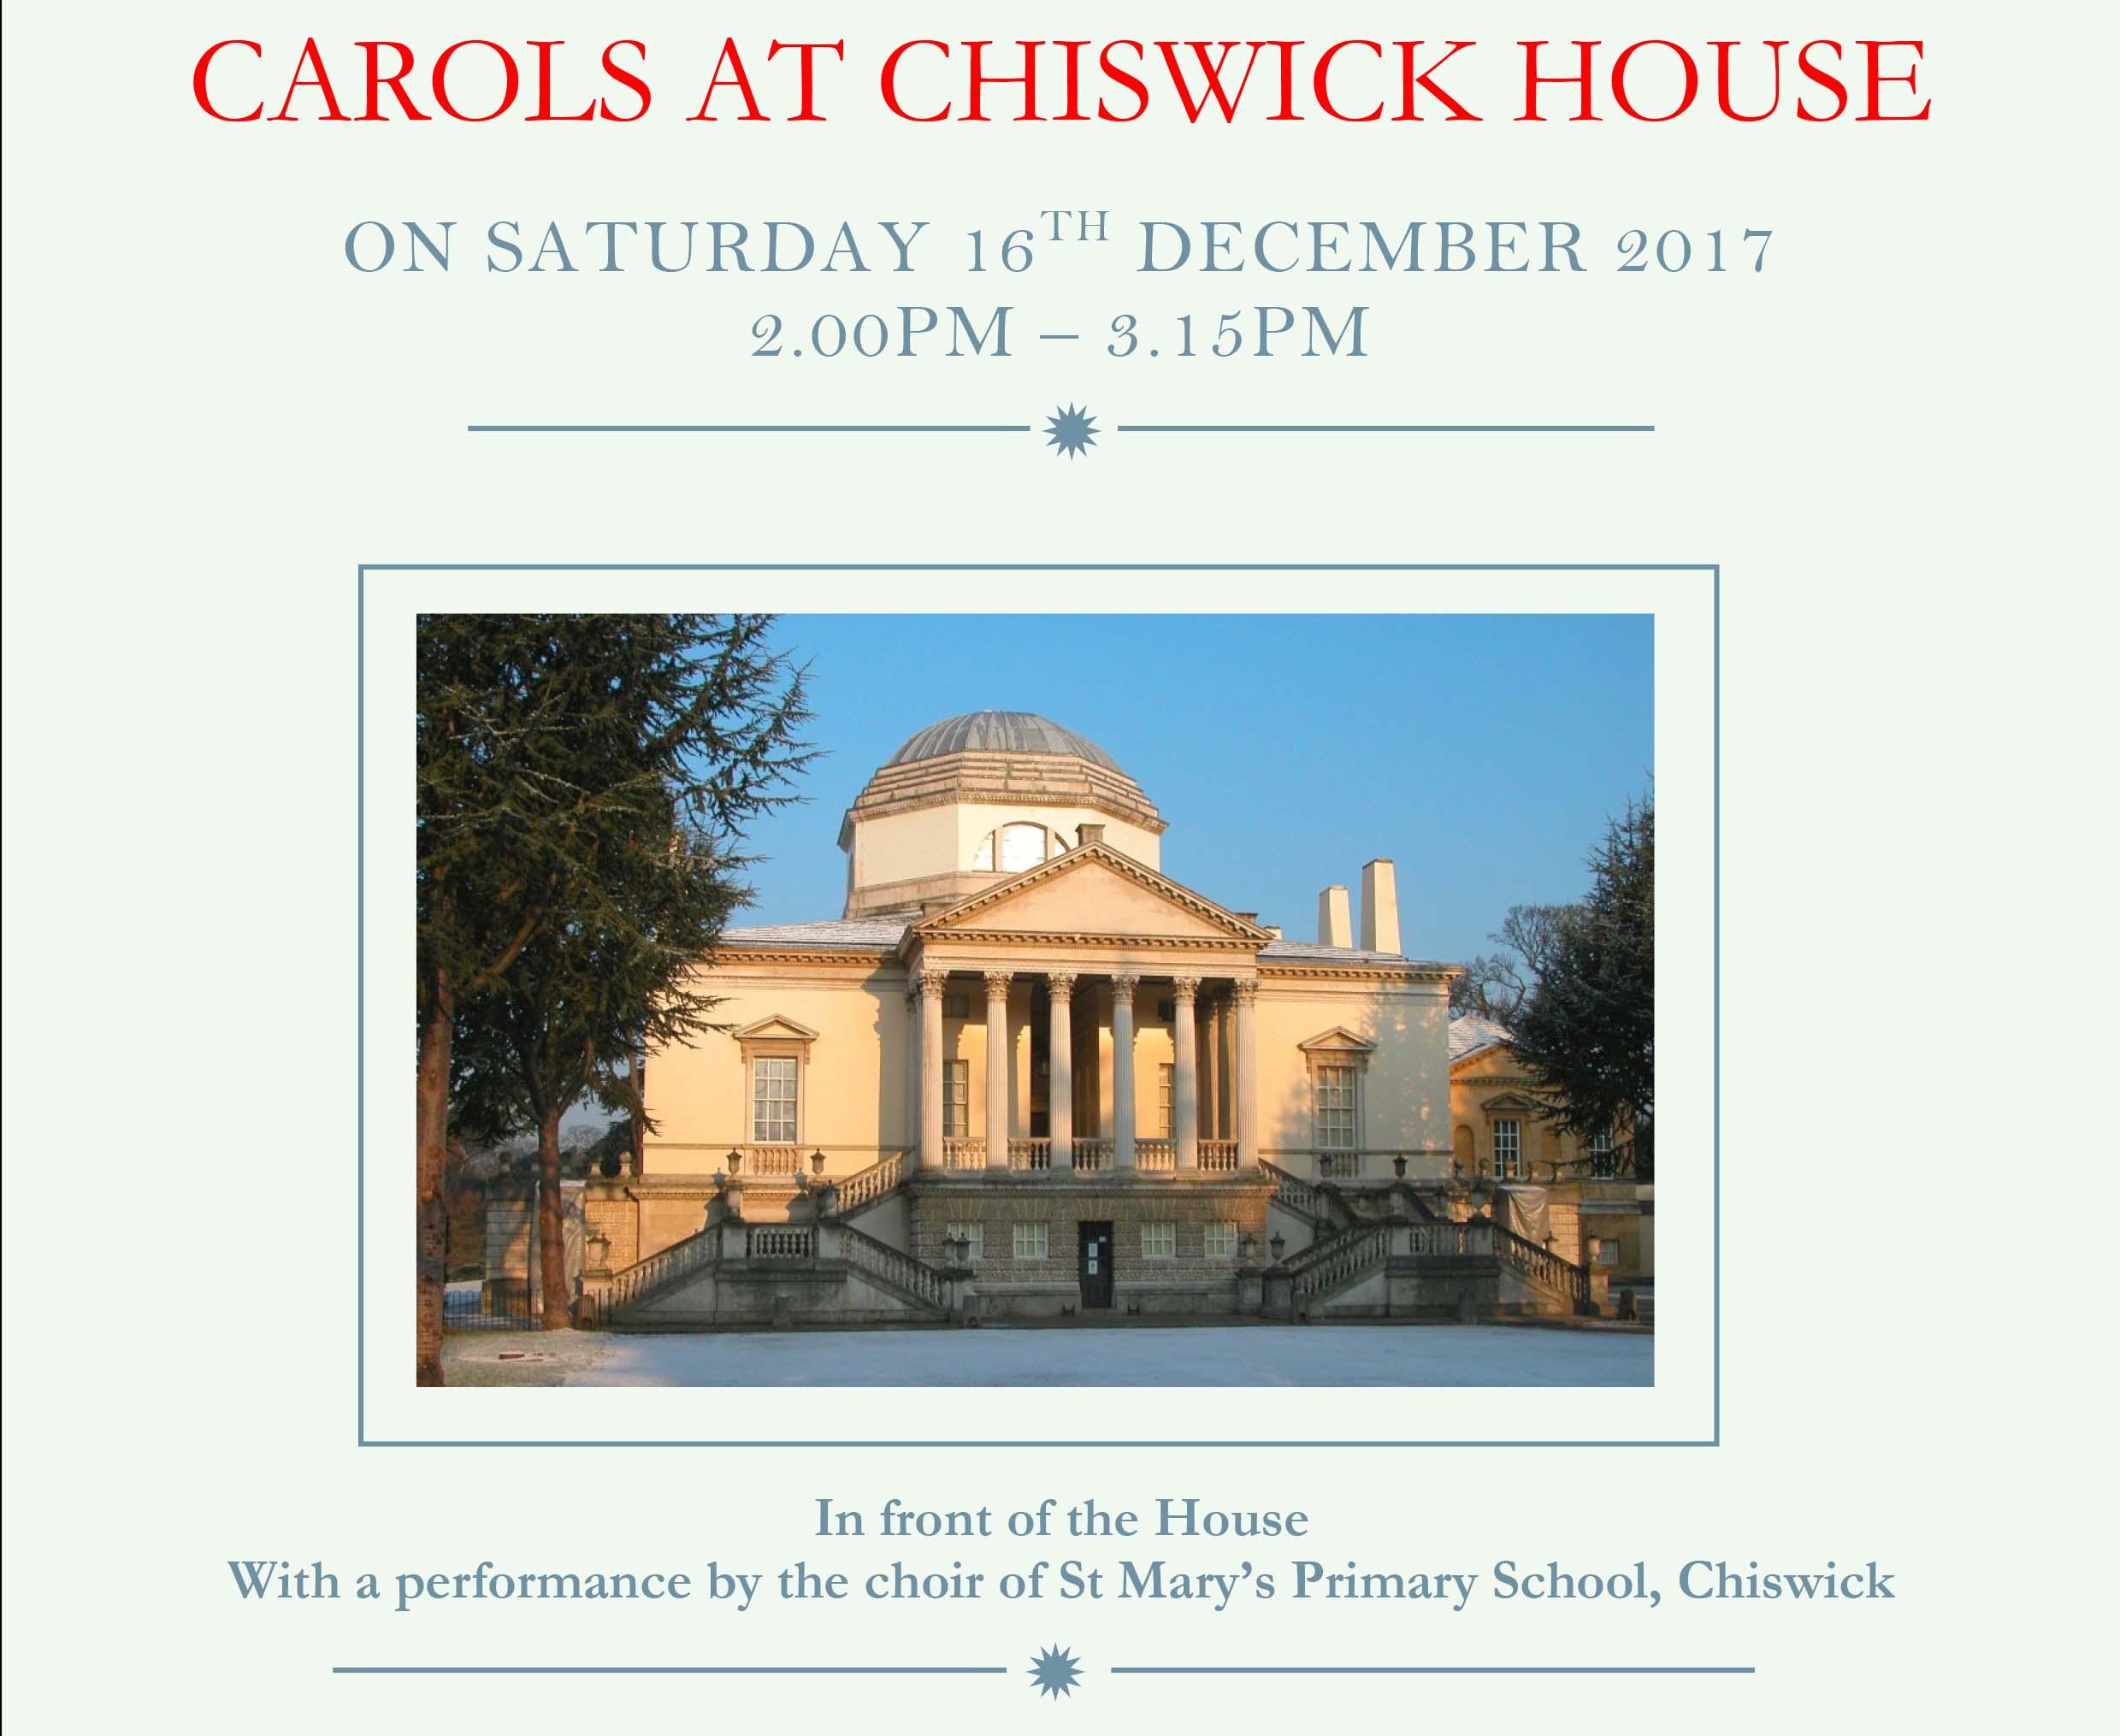 Chiswick House Carols